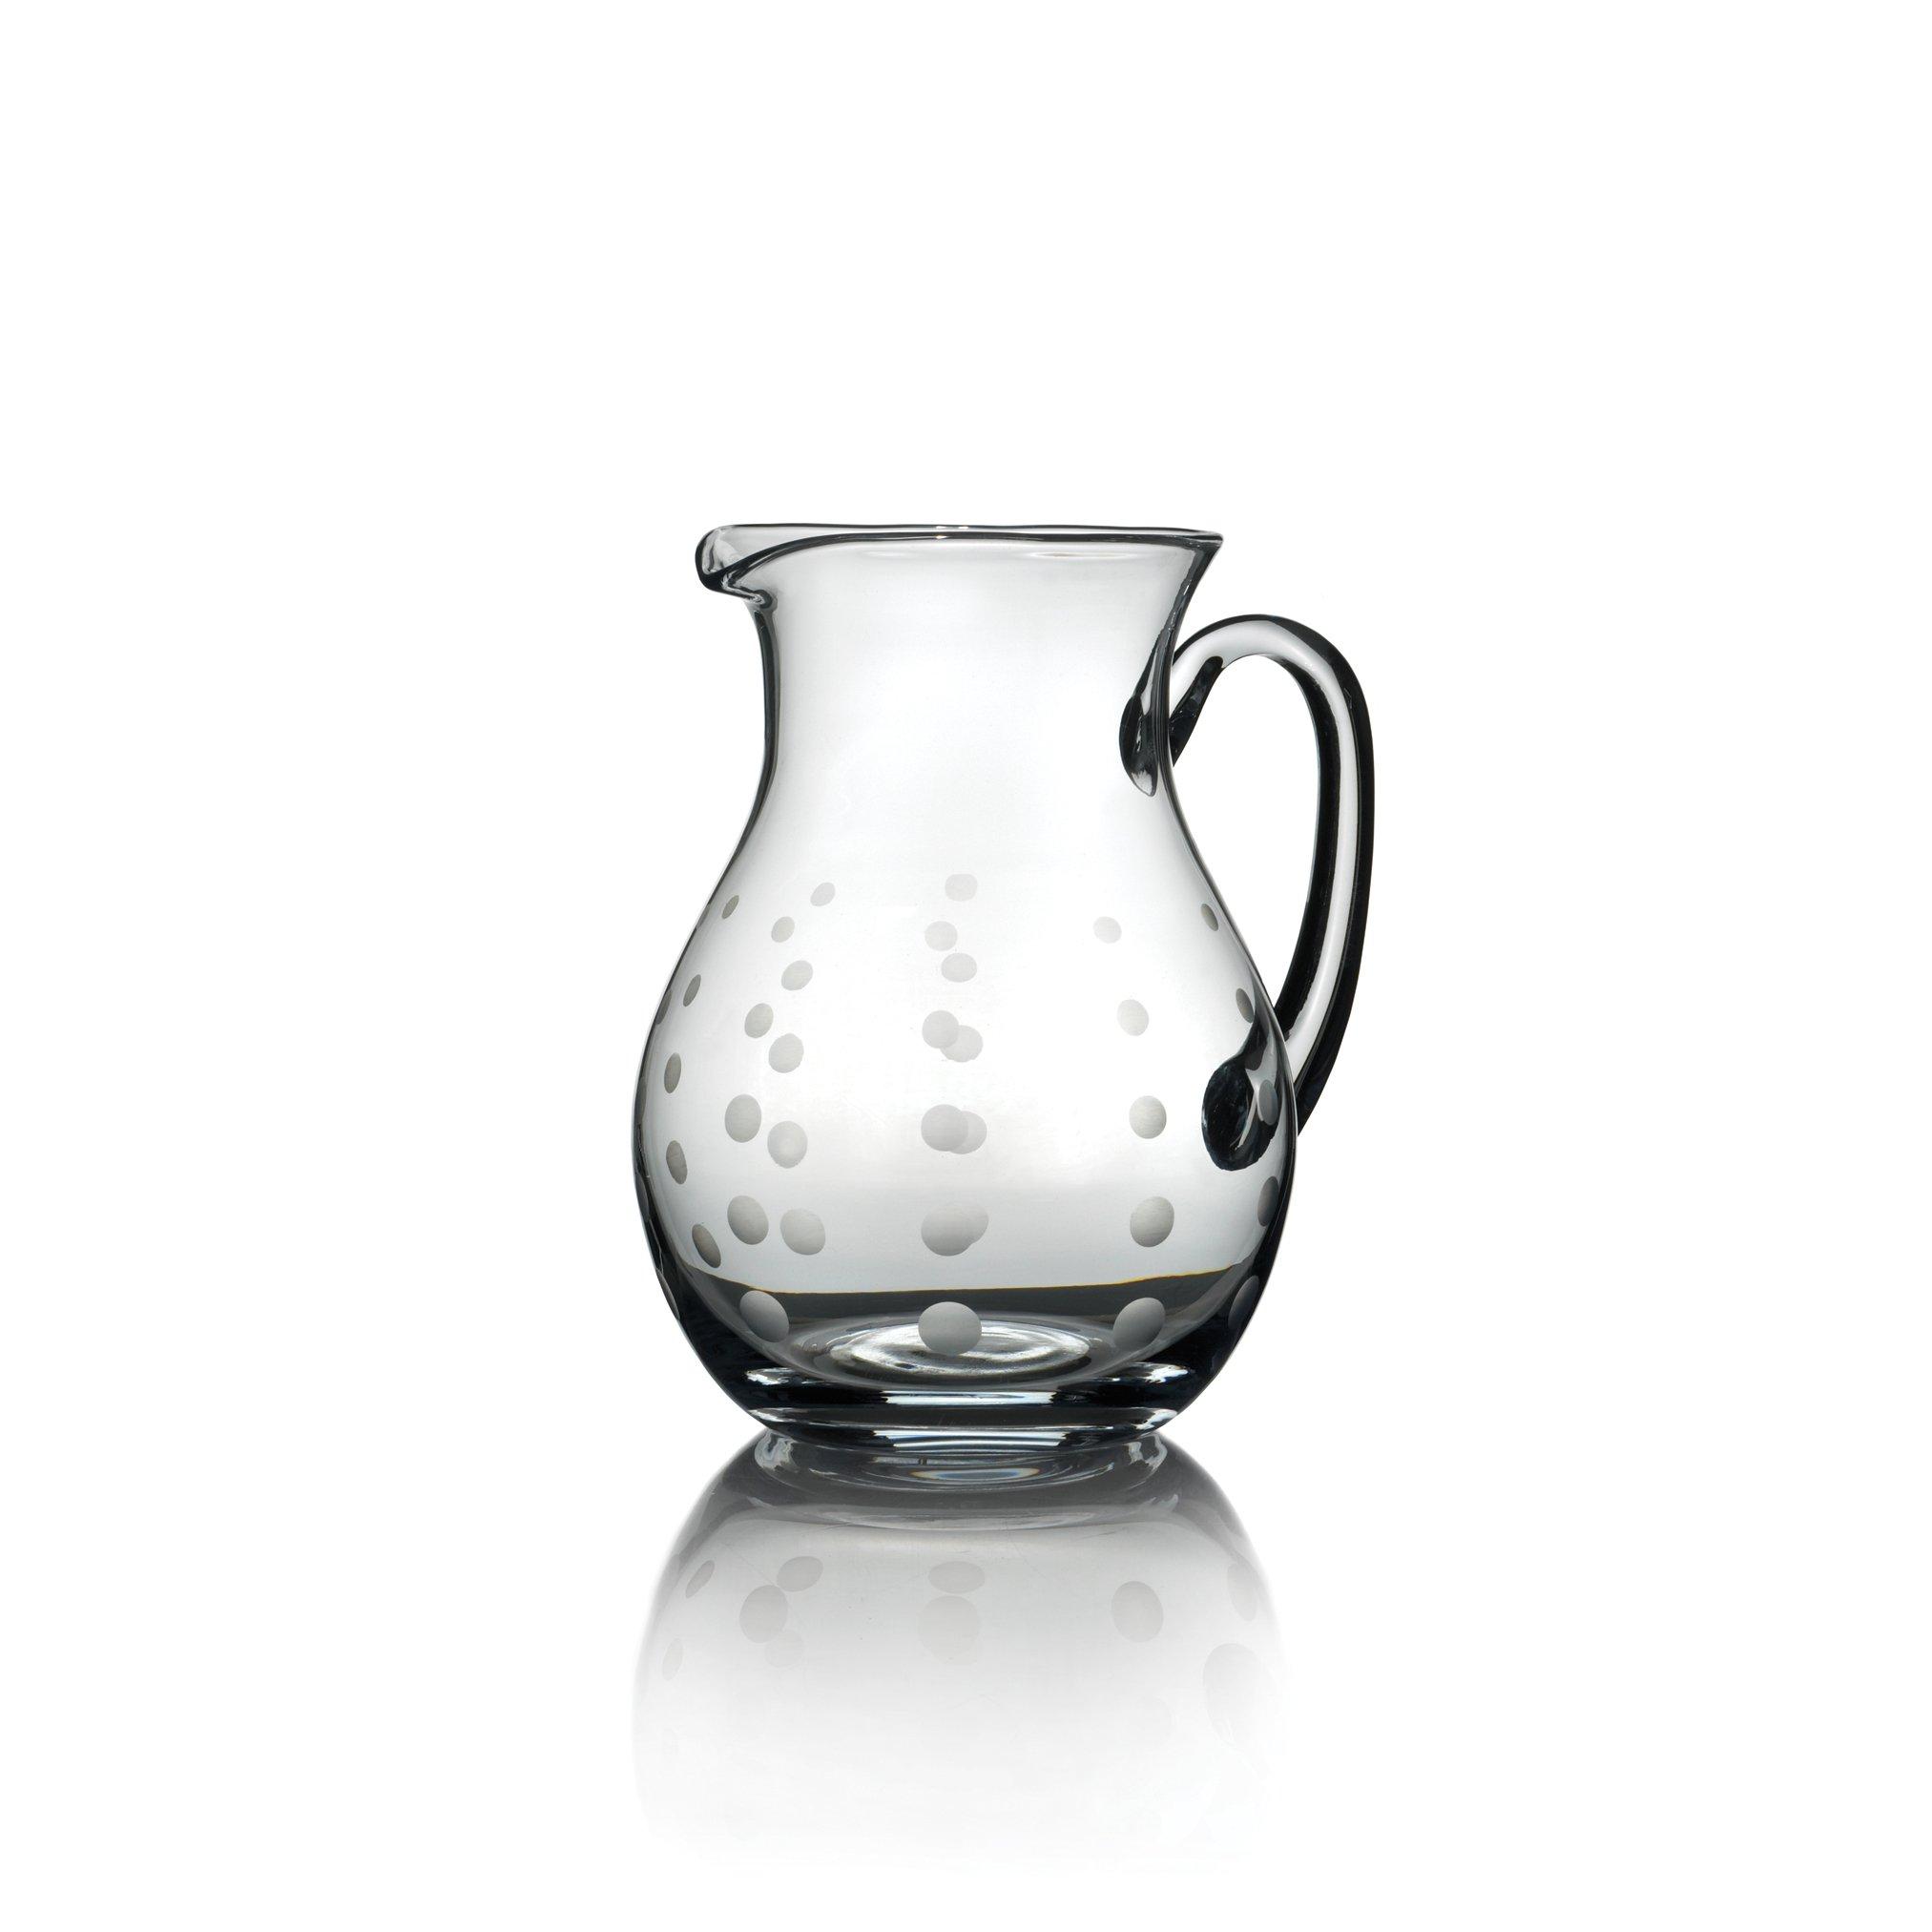 Mikasa Cheers Glass Beverage Pitcher, 3.25-Quart